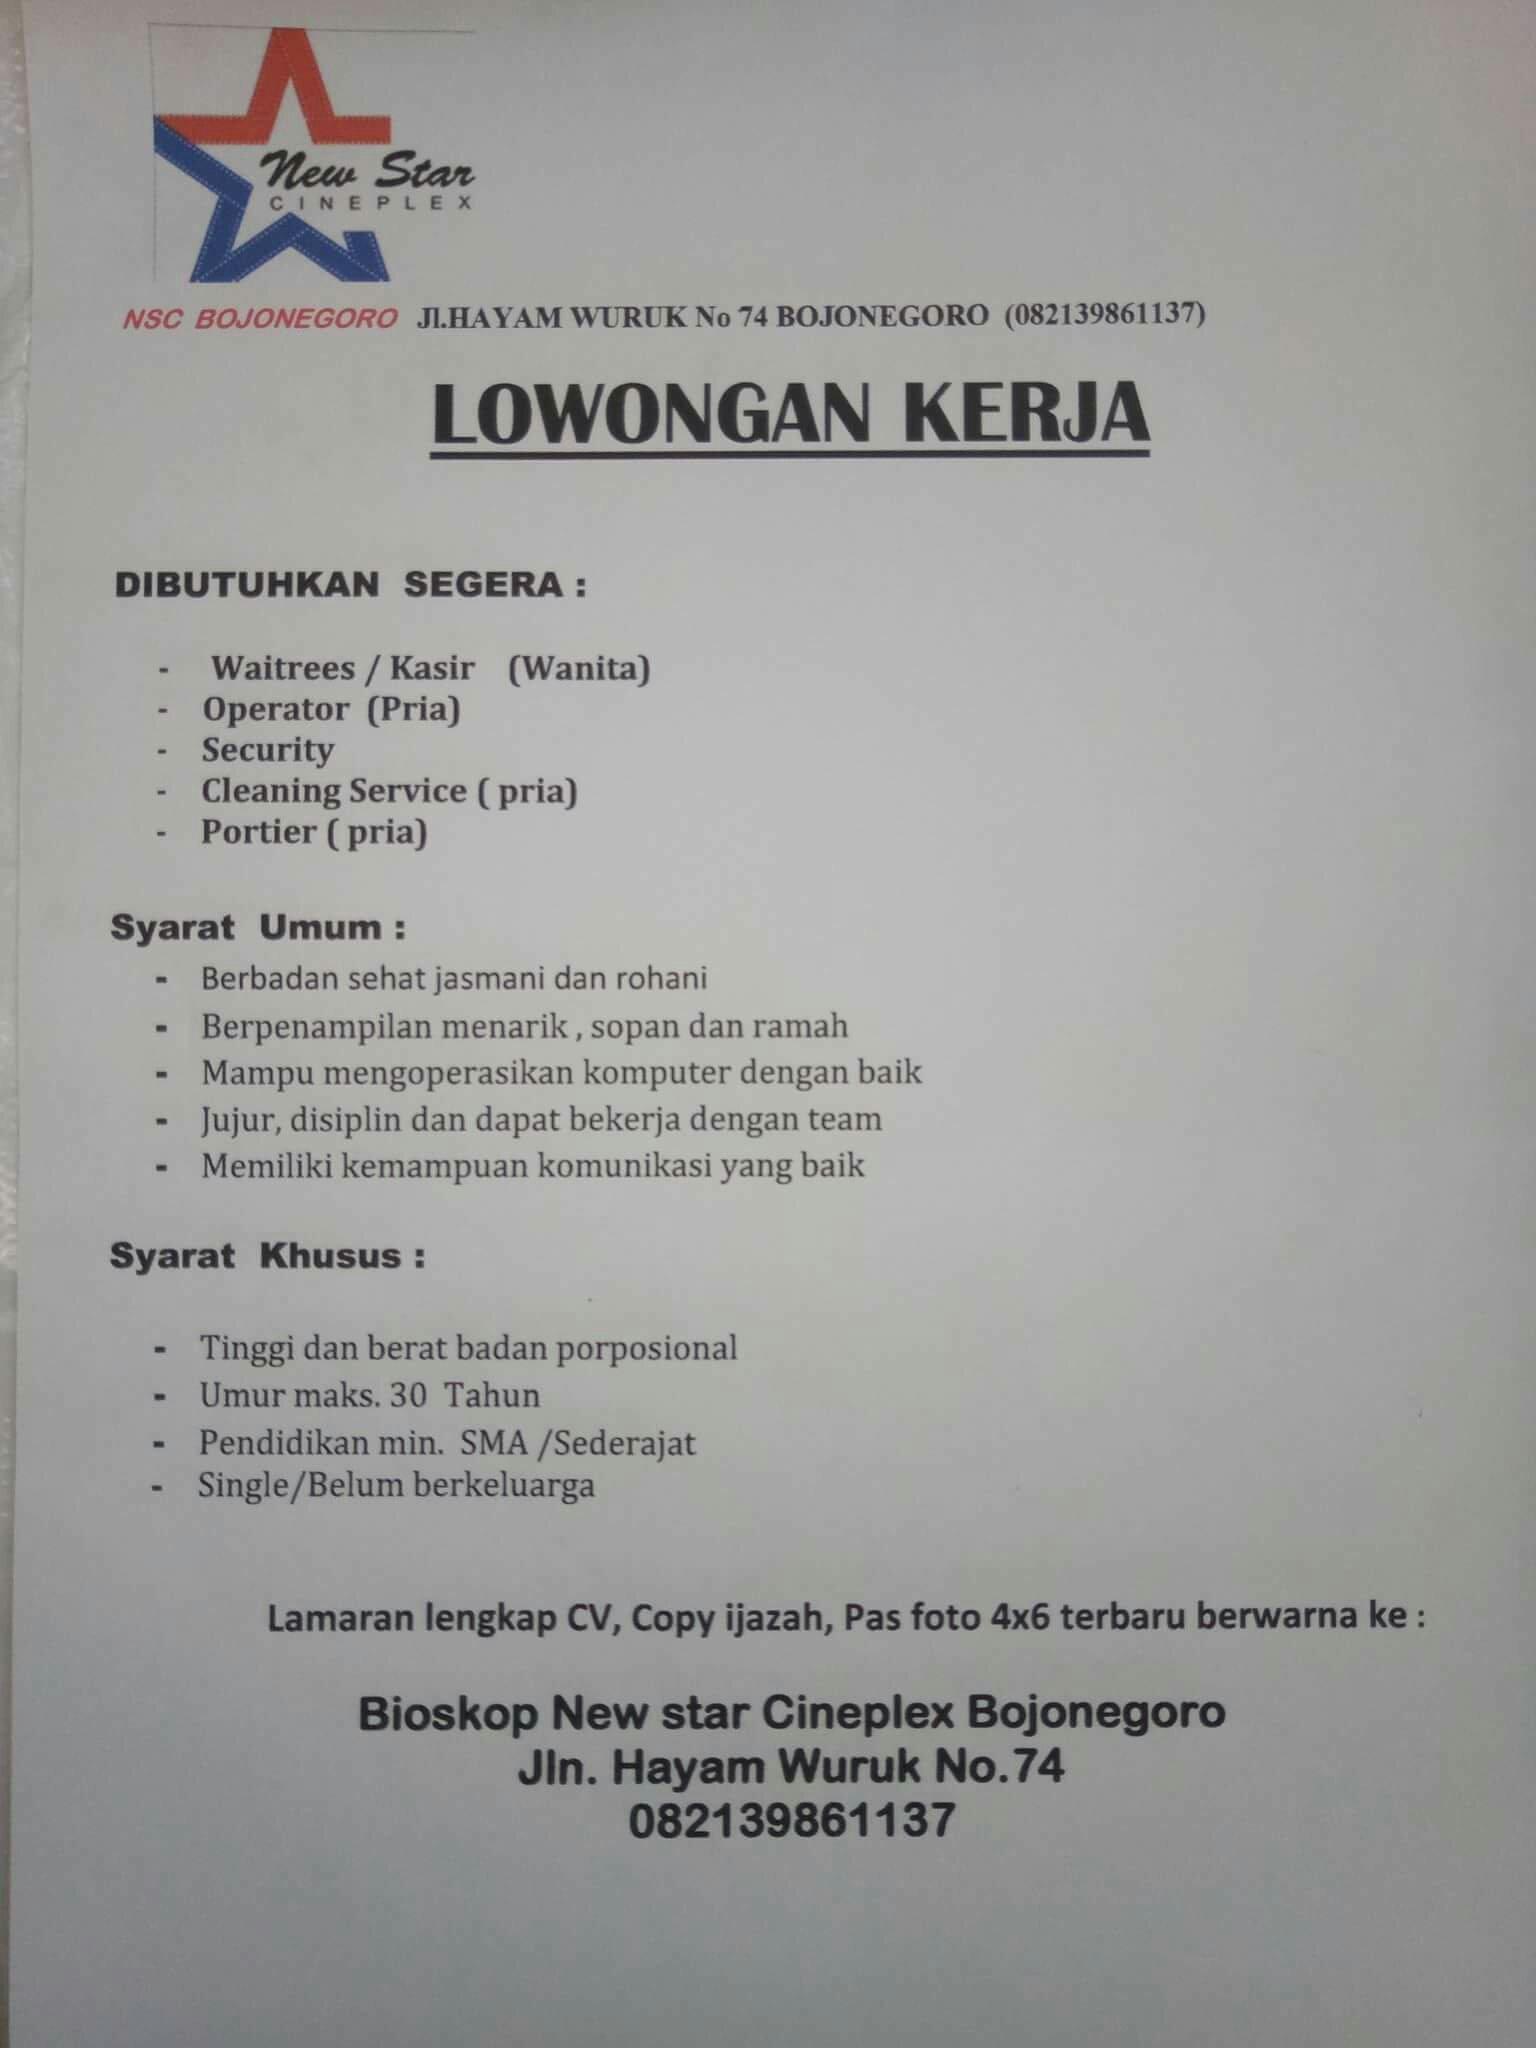 Bojonegoro Projects Development Page 21 Skyscrapercity Yah Lowoongan Kerjanya Hehehe